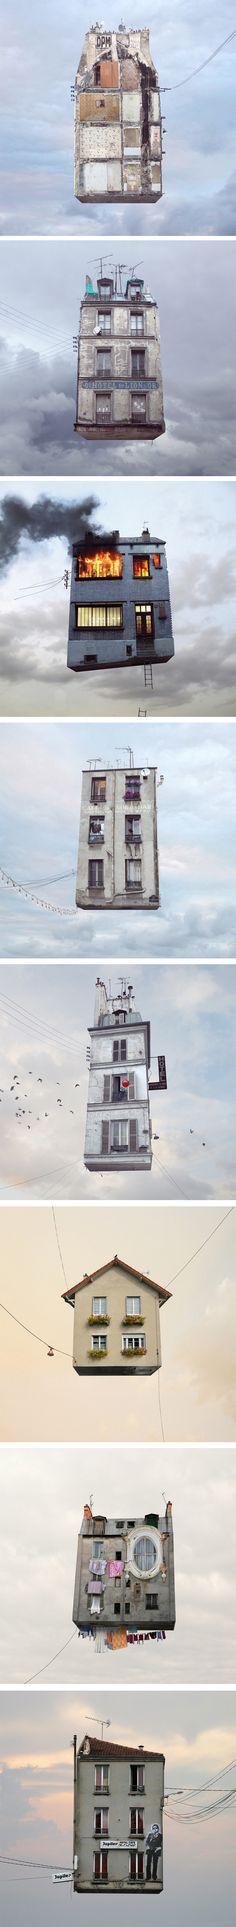 Laurent Chéhère on the LPP blog.  All images via the artist.